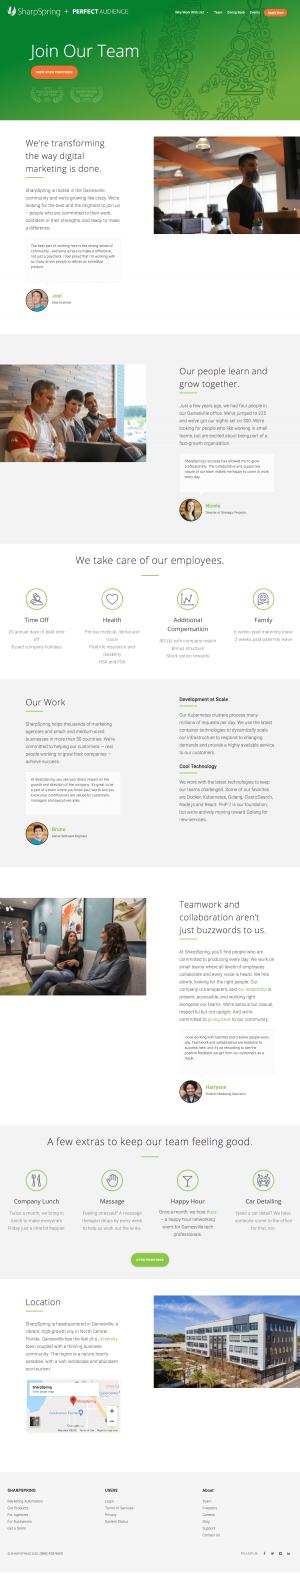 SharpSpring – Career page